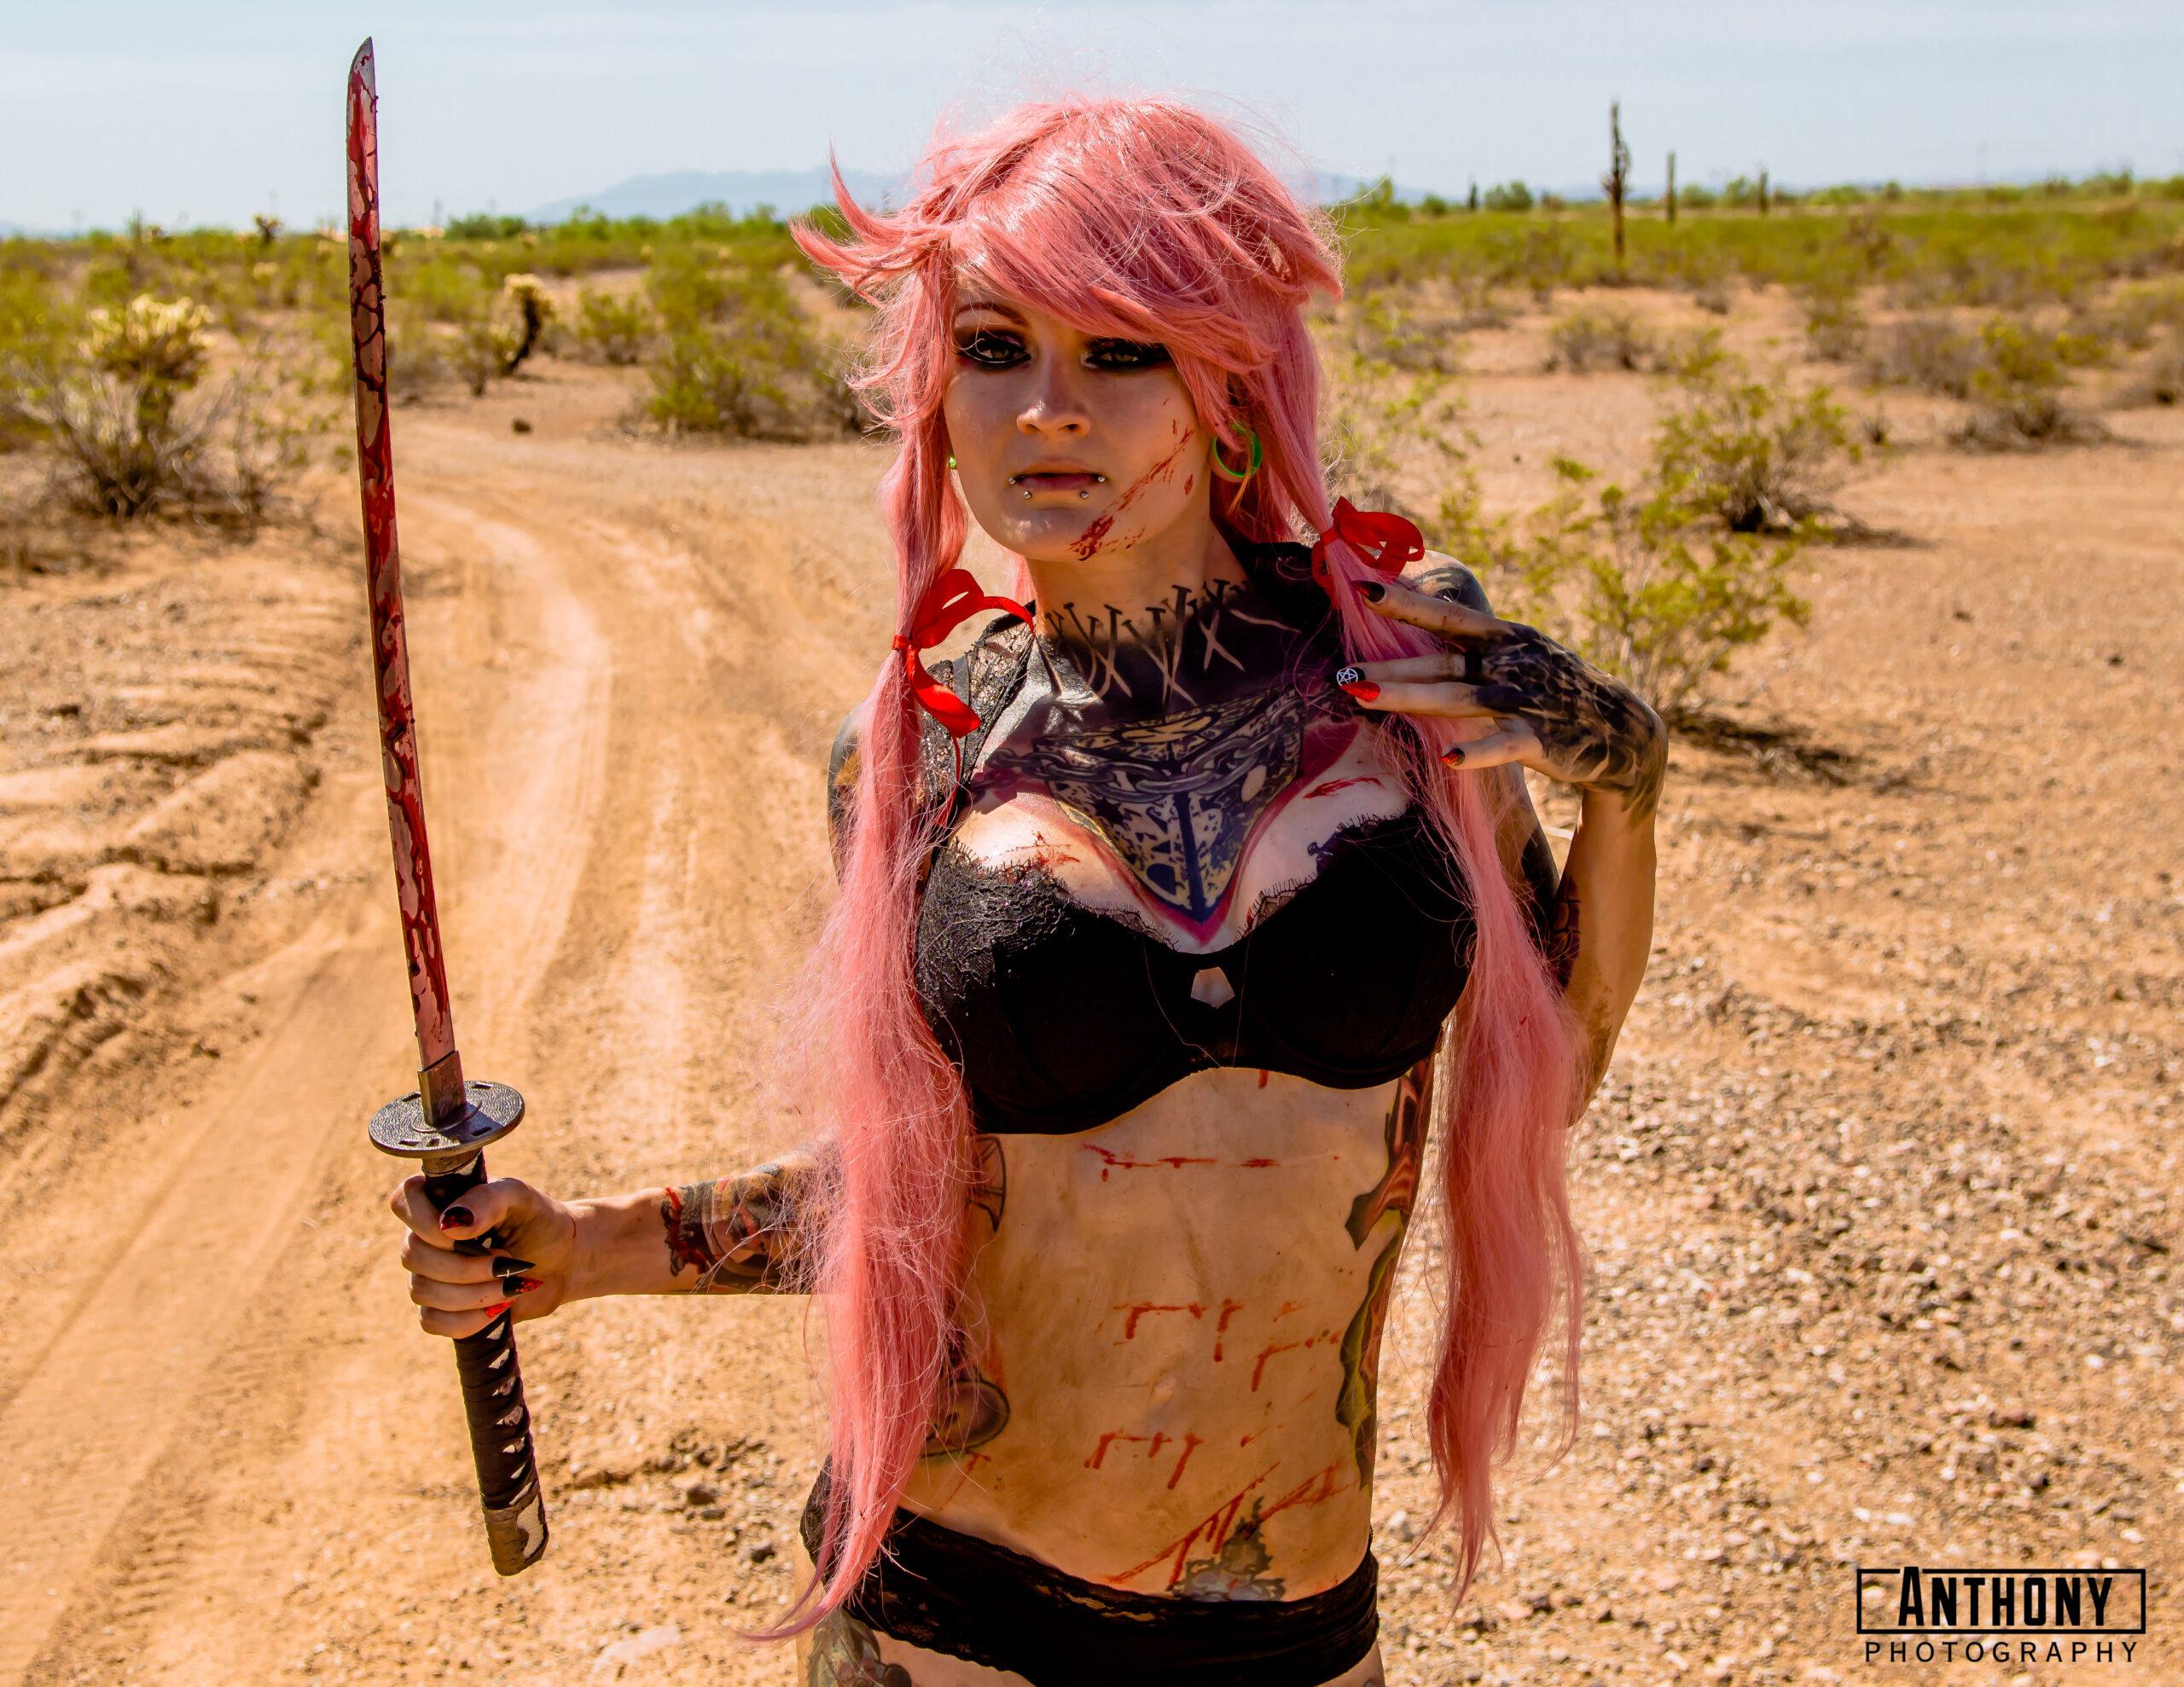 dollydestruction-cosplay-yunogasai-tattoomodel-inkedmodel-tattoos-horrortattoos-inkedmag-pinkhair